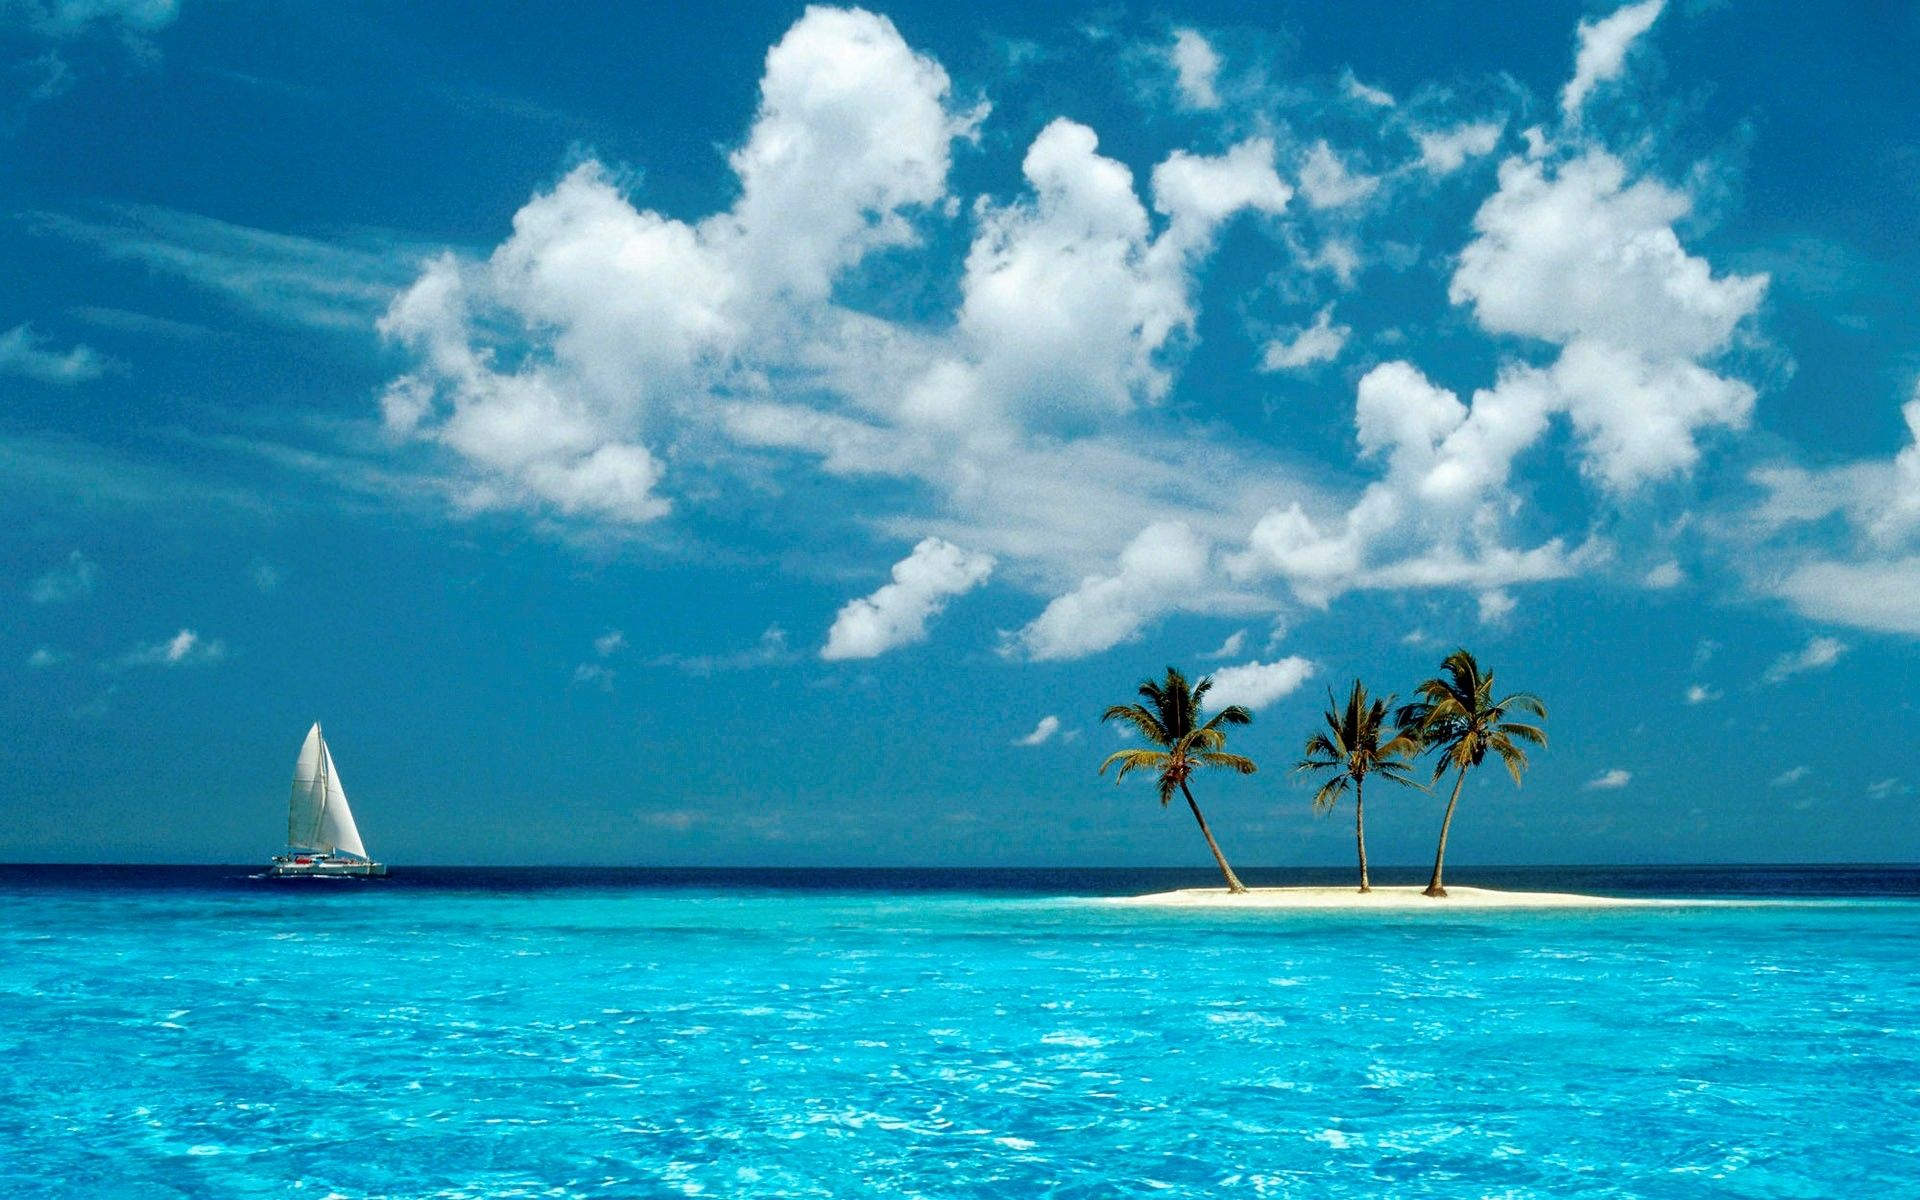 island wallpaper | images wallpapers | pinterest | wallpaper